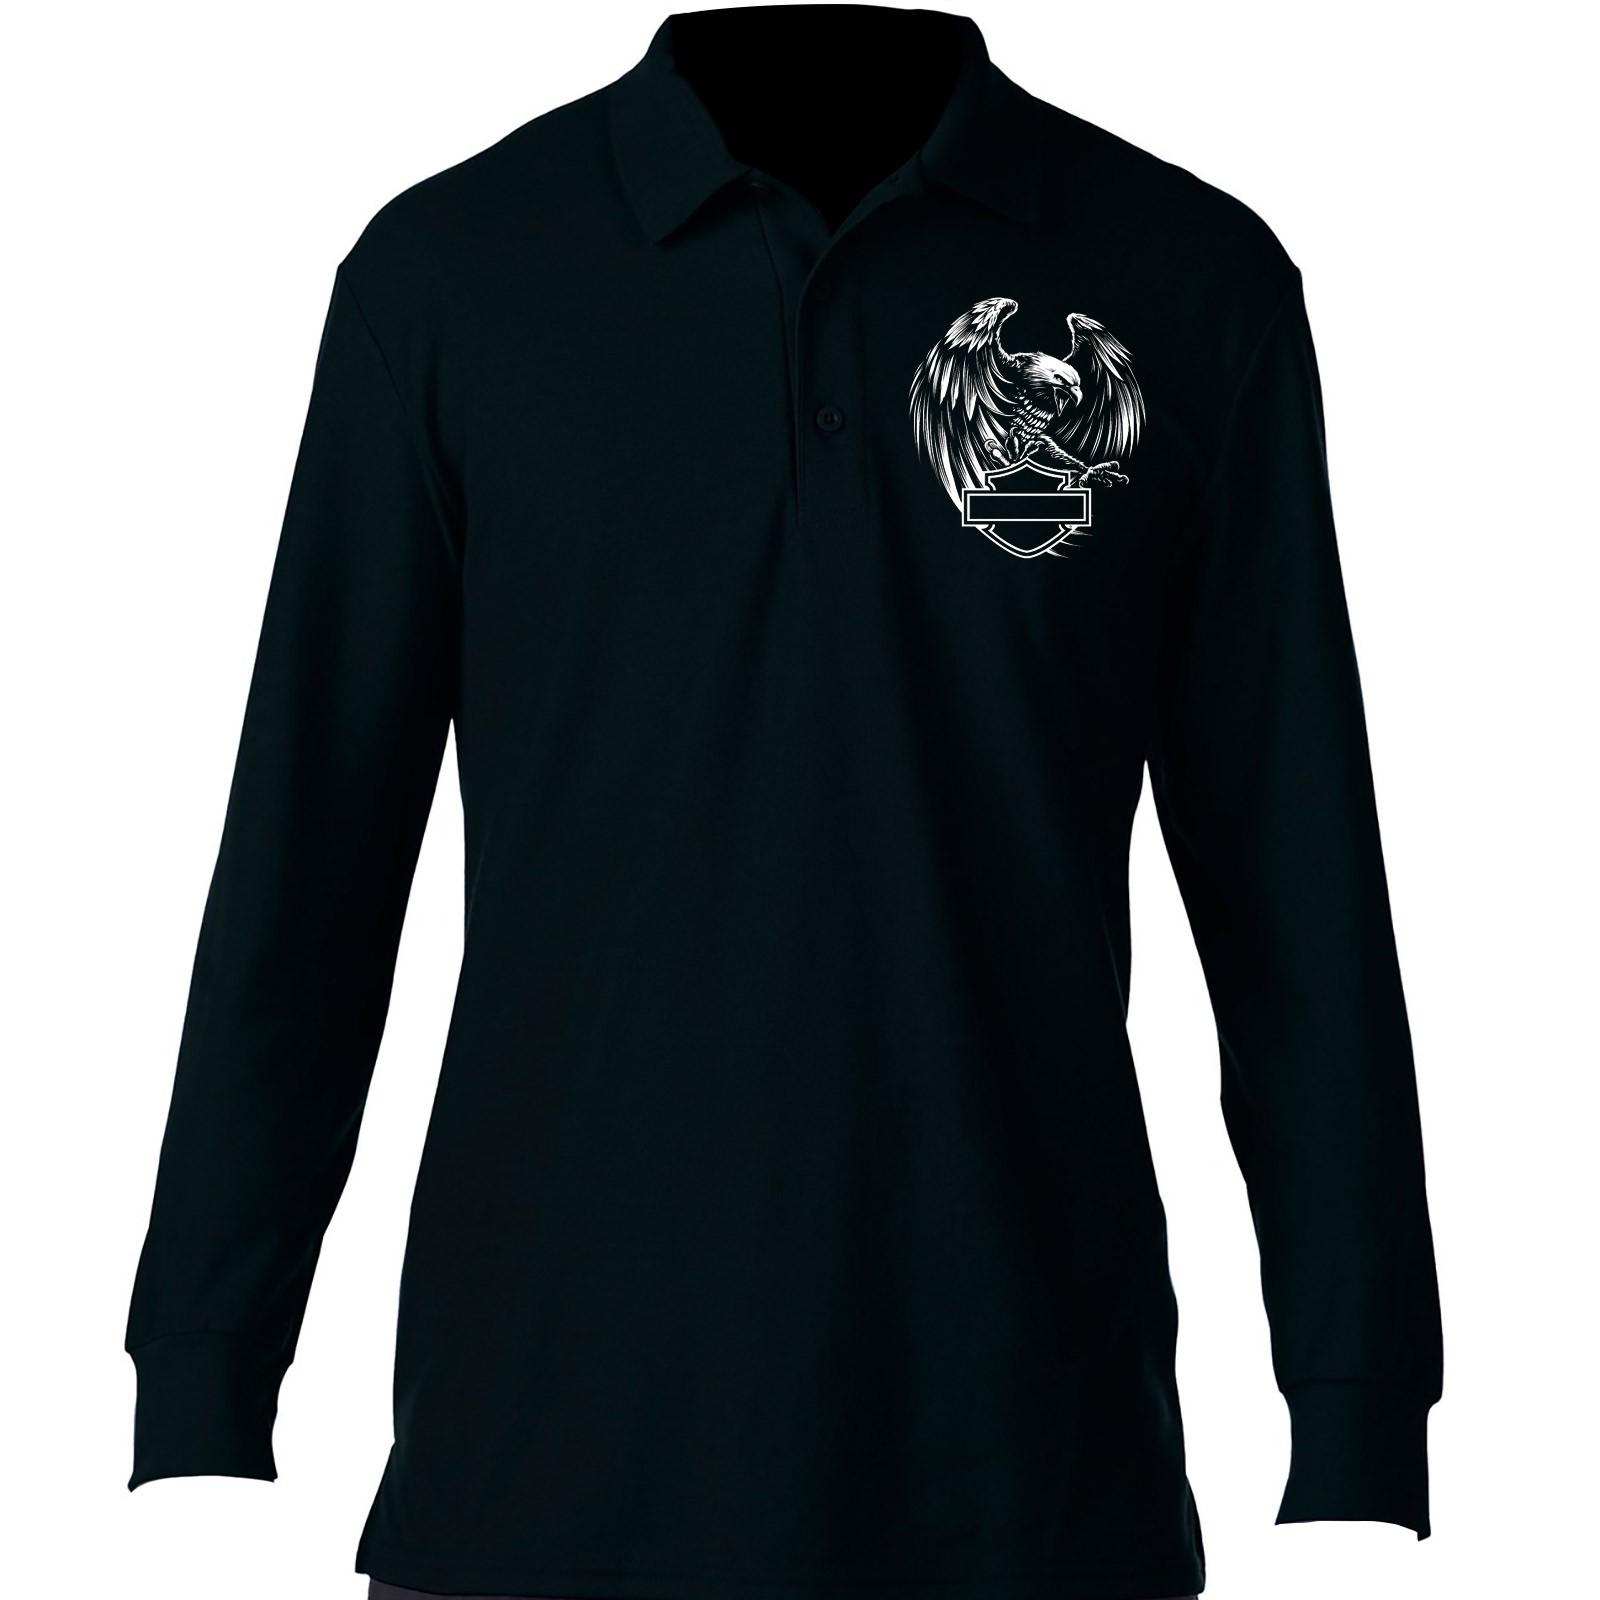 5b80846ba9f Harley-Davidson Men's Long-Sleeve Sport Shirt - Overseas Tour | Eagle Polo